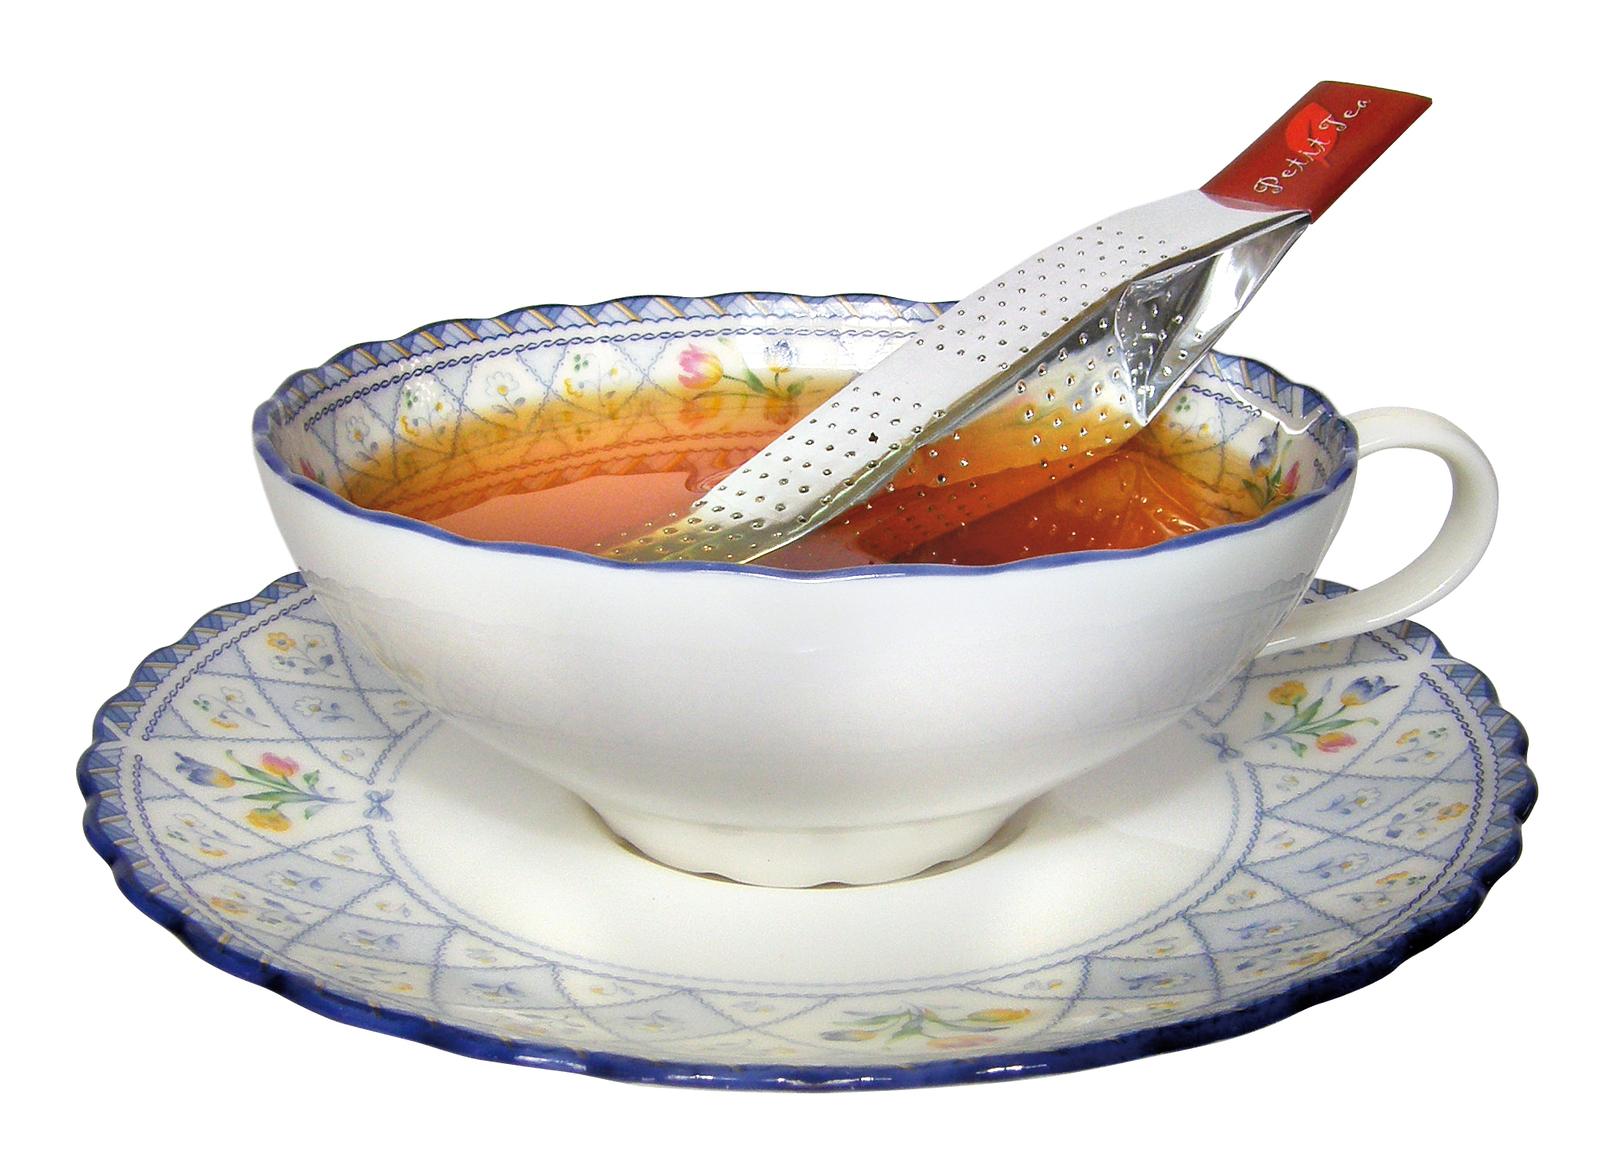 Masala Chai Latte in Tea Infusers, Petit Tea